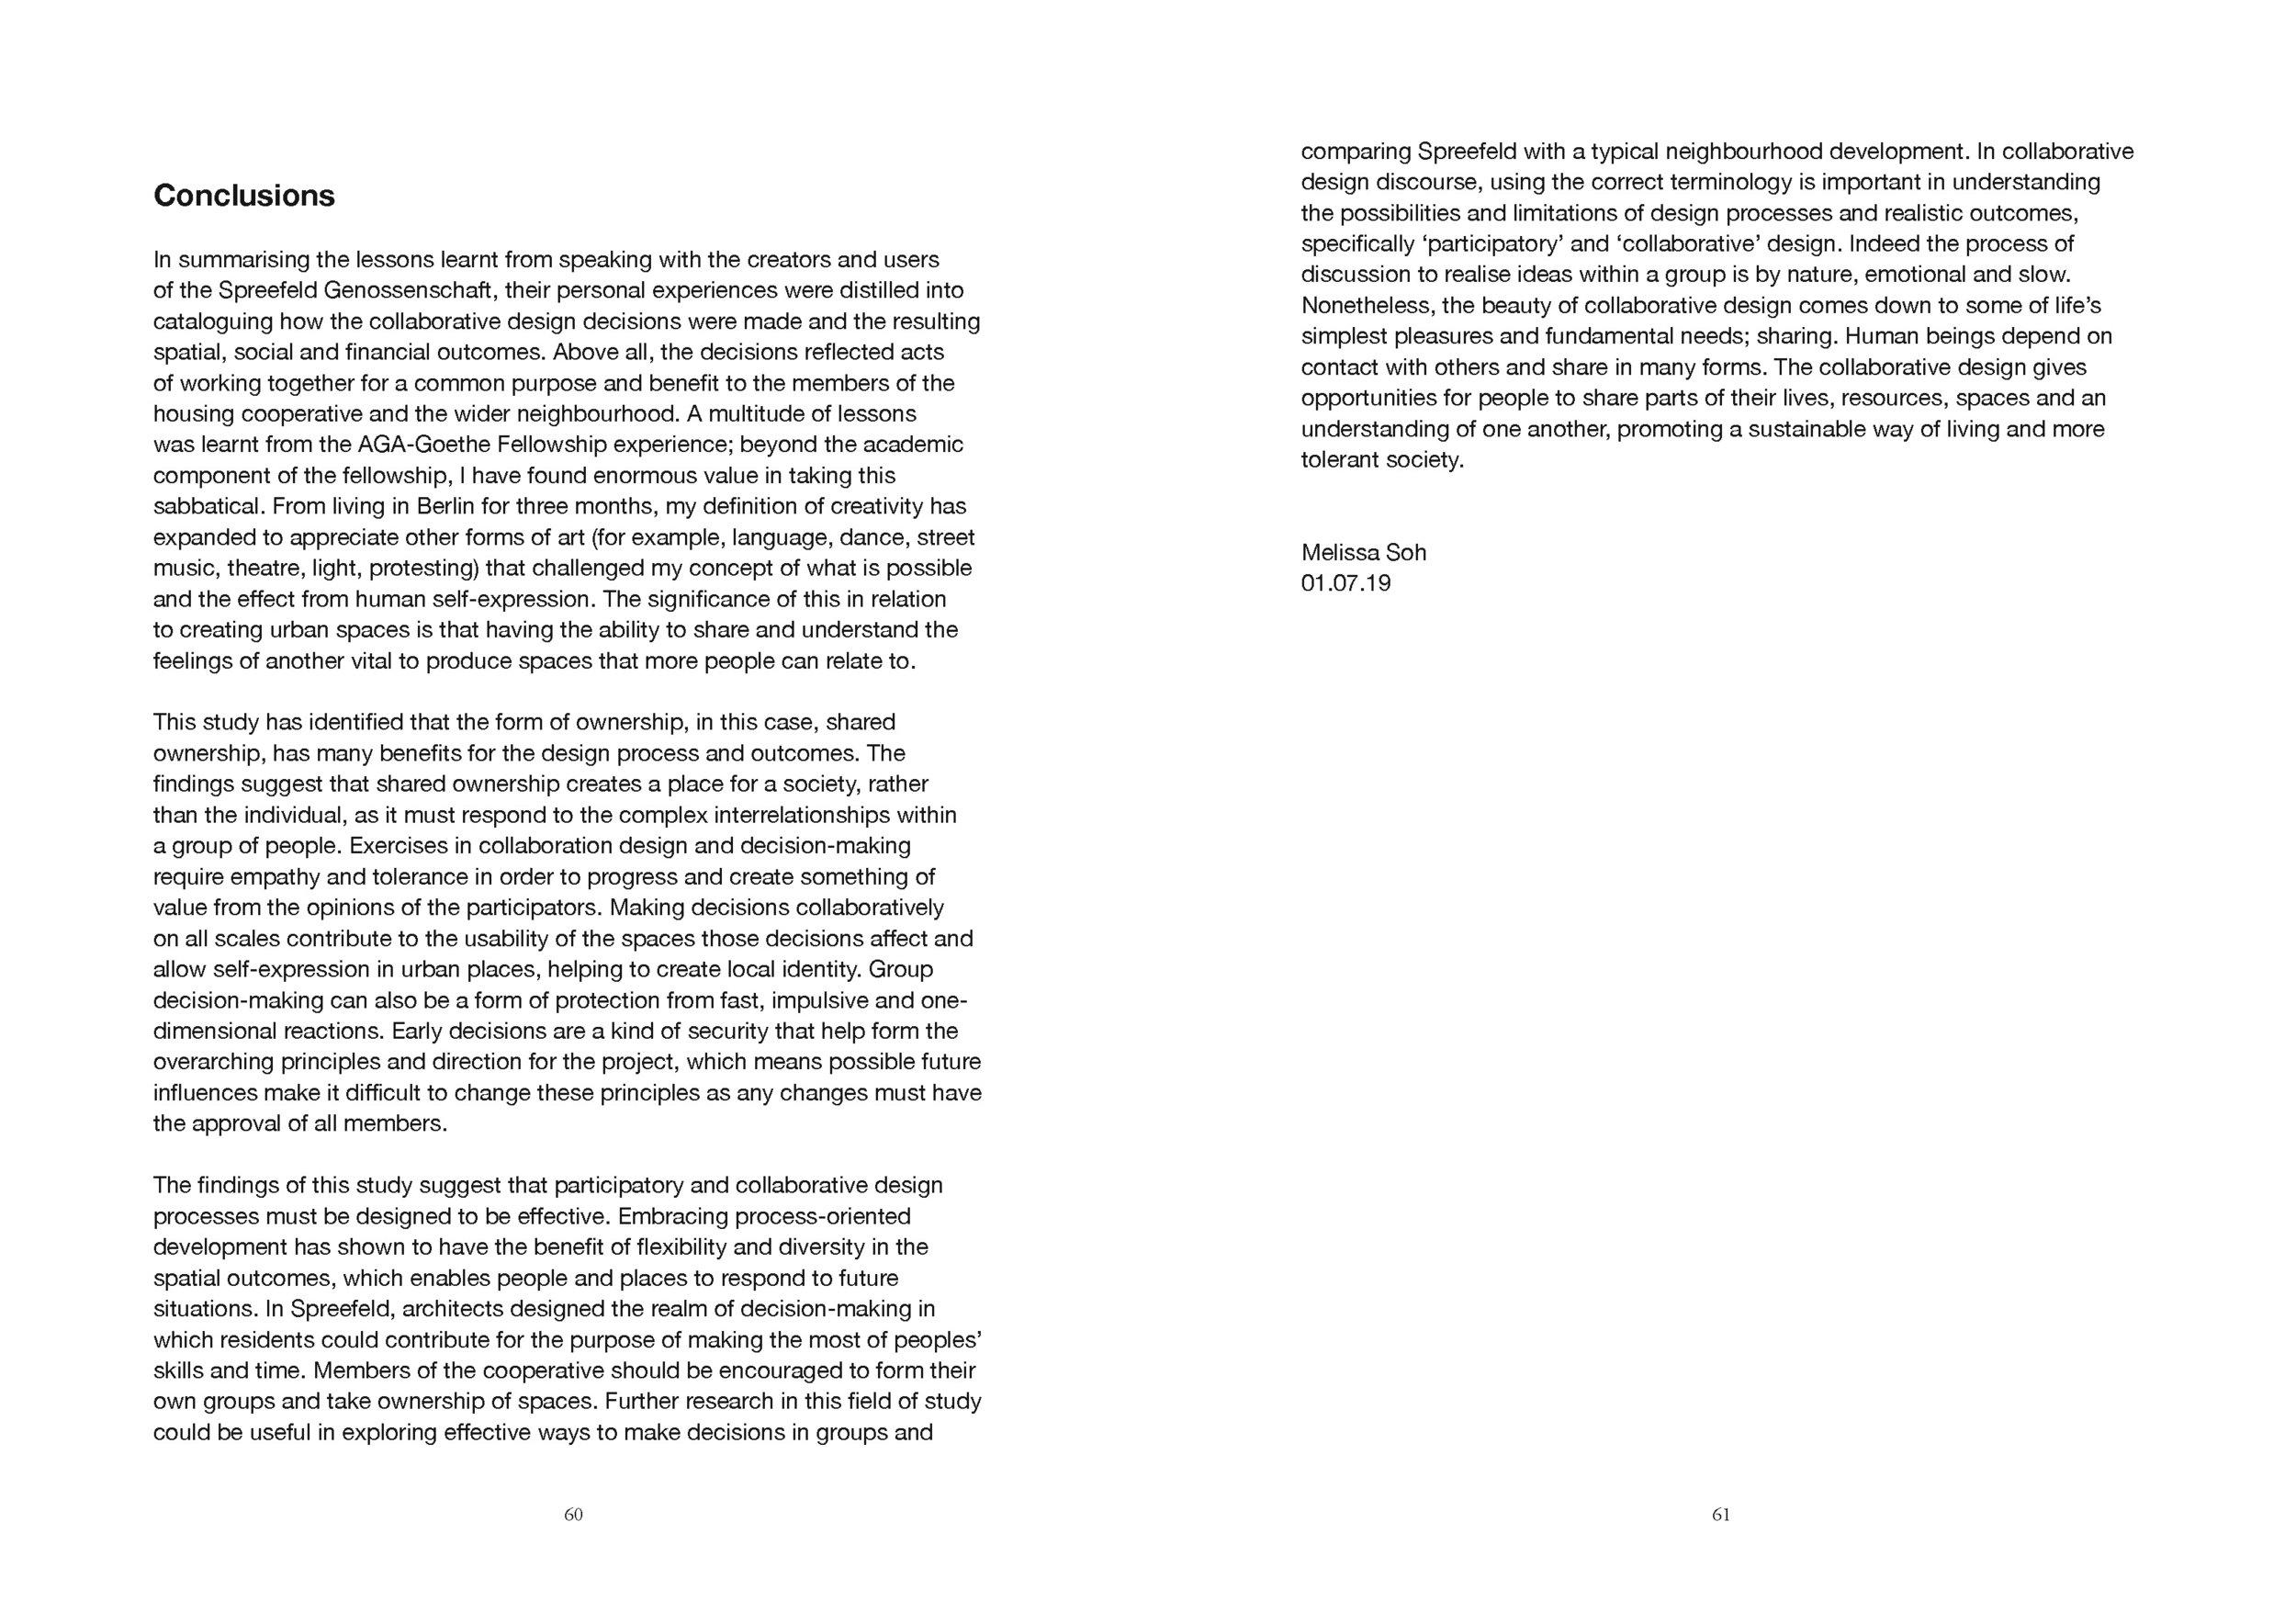 AGA-Goethe-Fellowship-Report_Melissa-Soh_Page_31.jpg